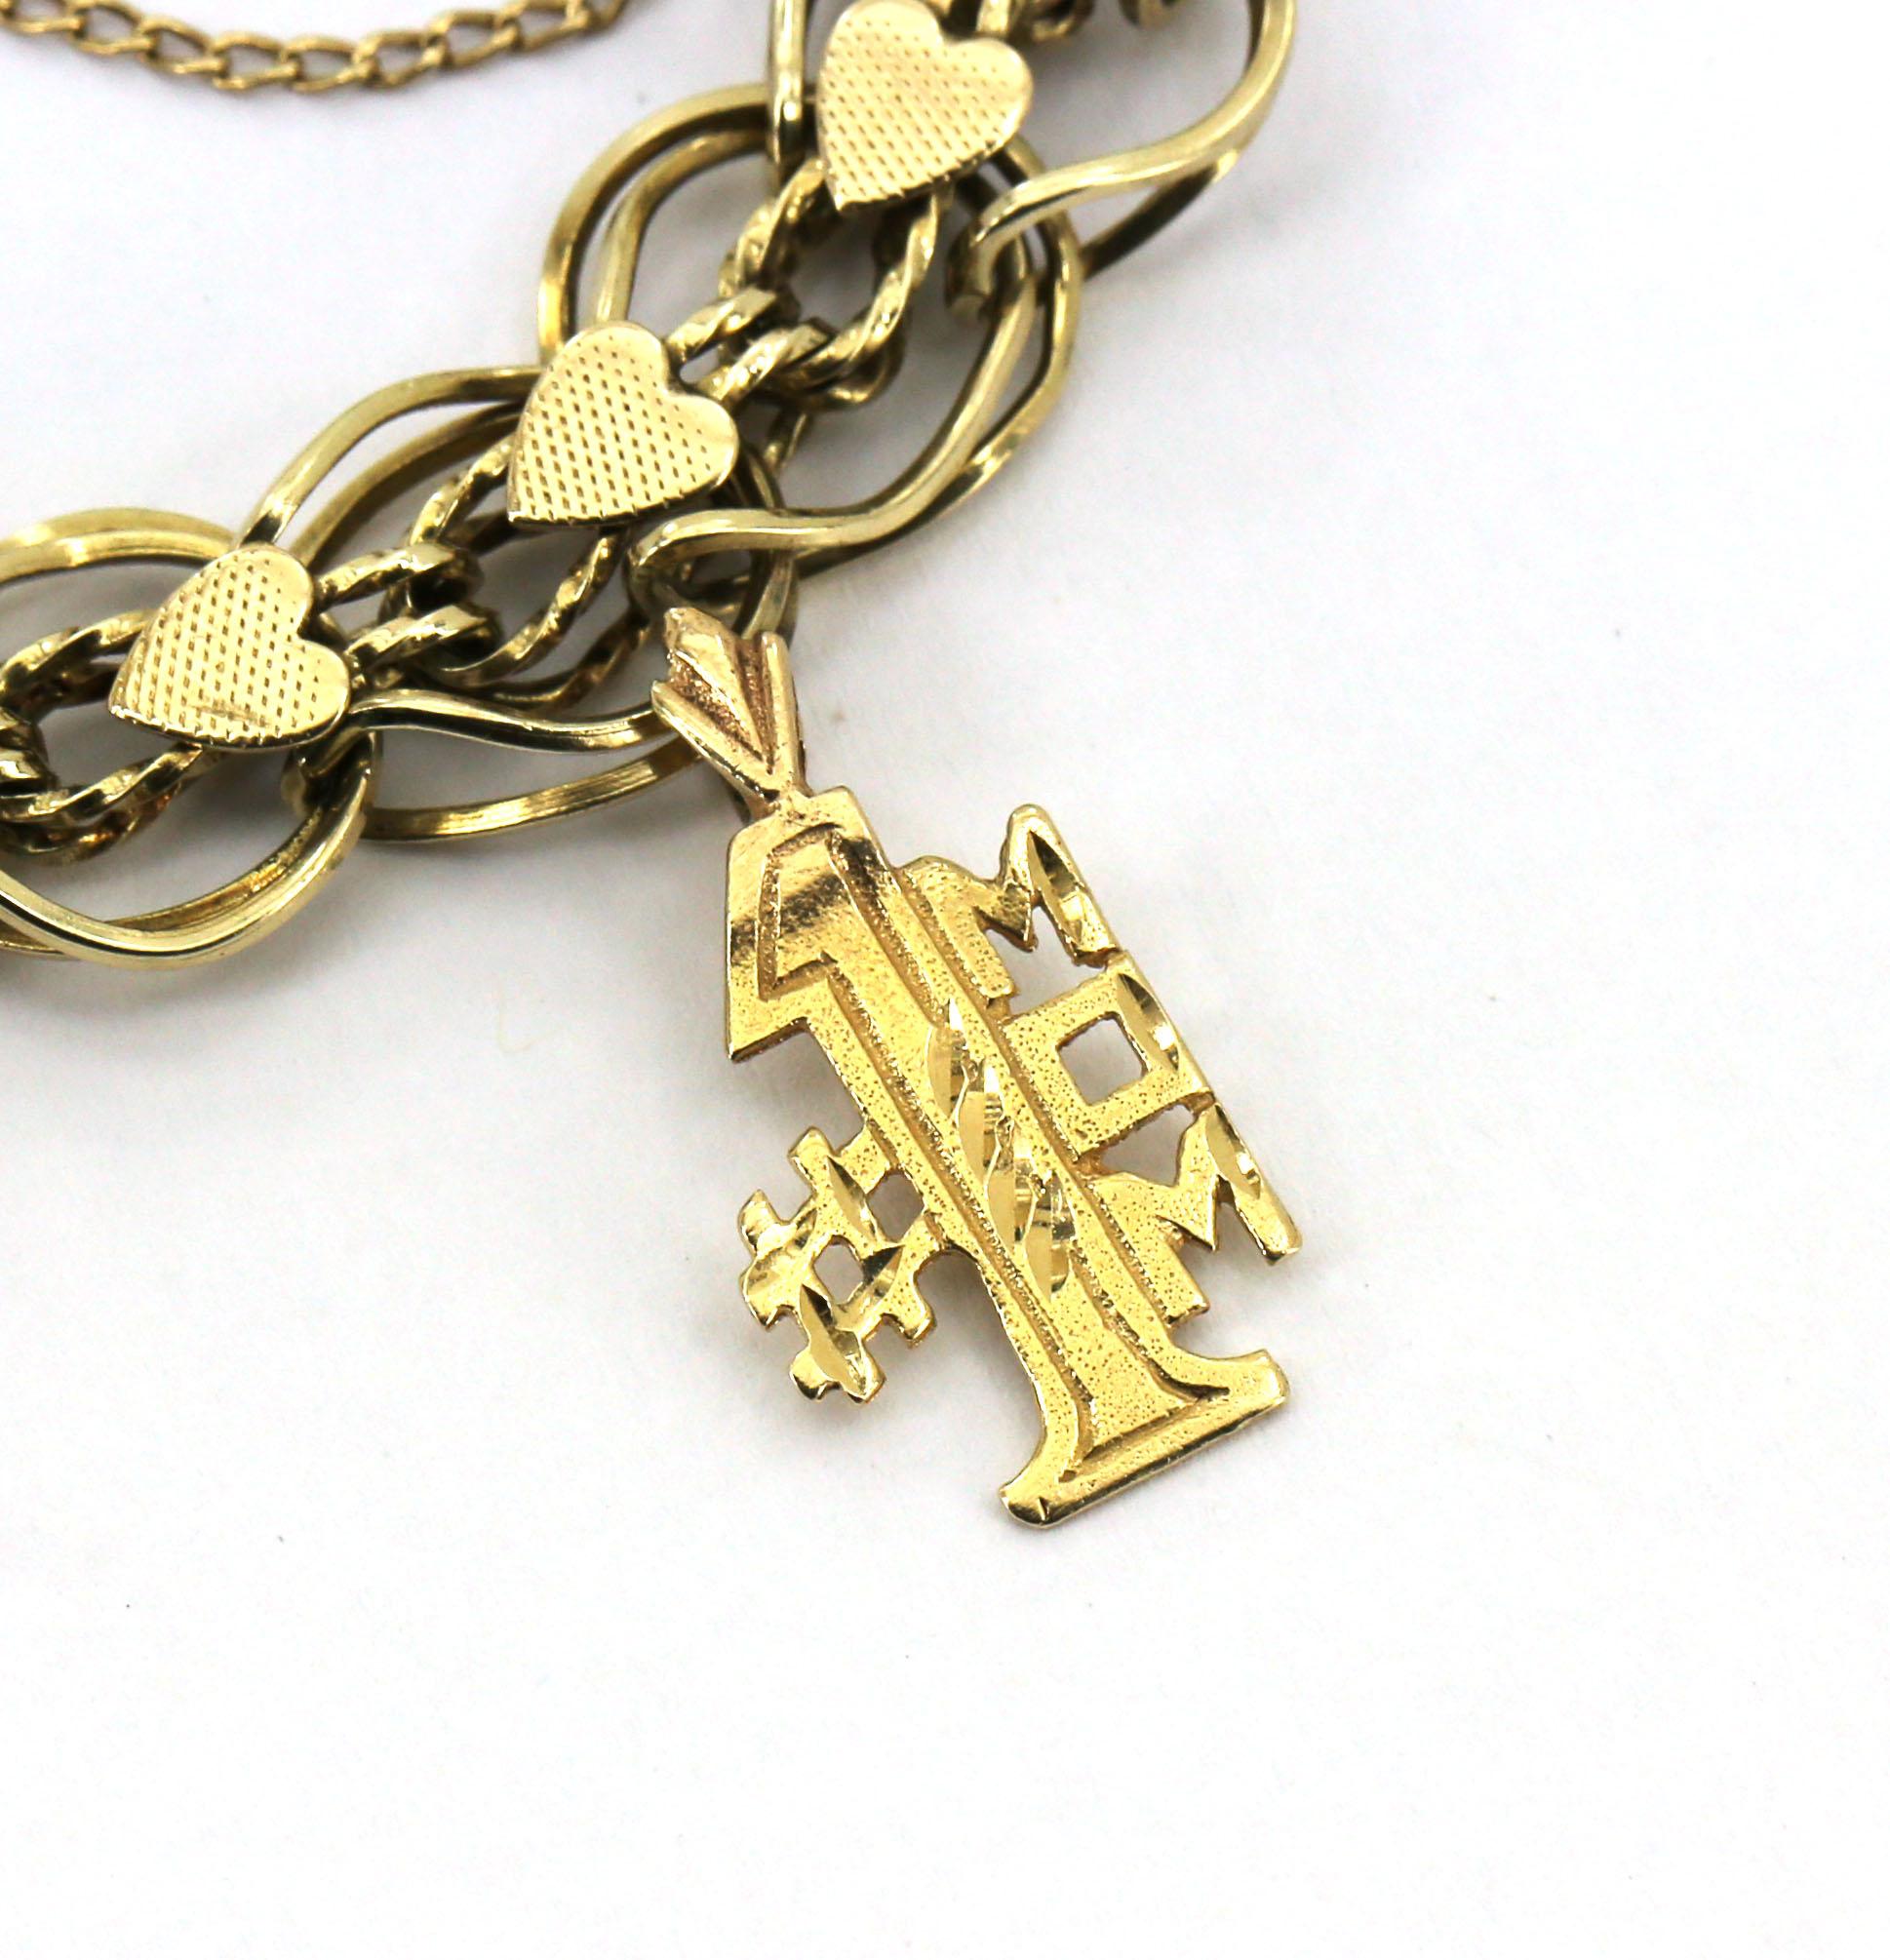 Vintage 14k Gold Charm Bracelet: VINTAGE 14K YELLOW GOLD HEART MOTIF CHARM BRACELET W/ 4 3D